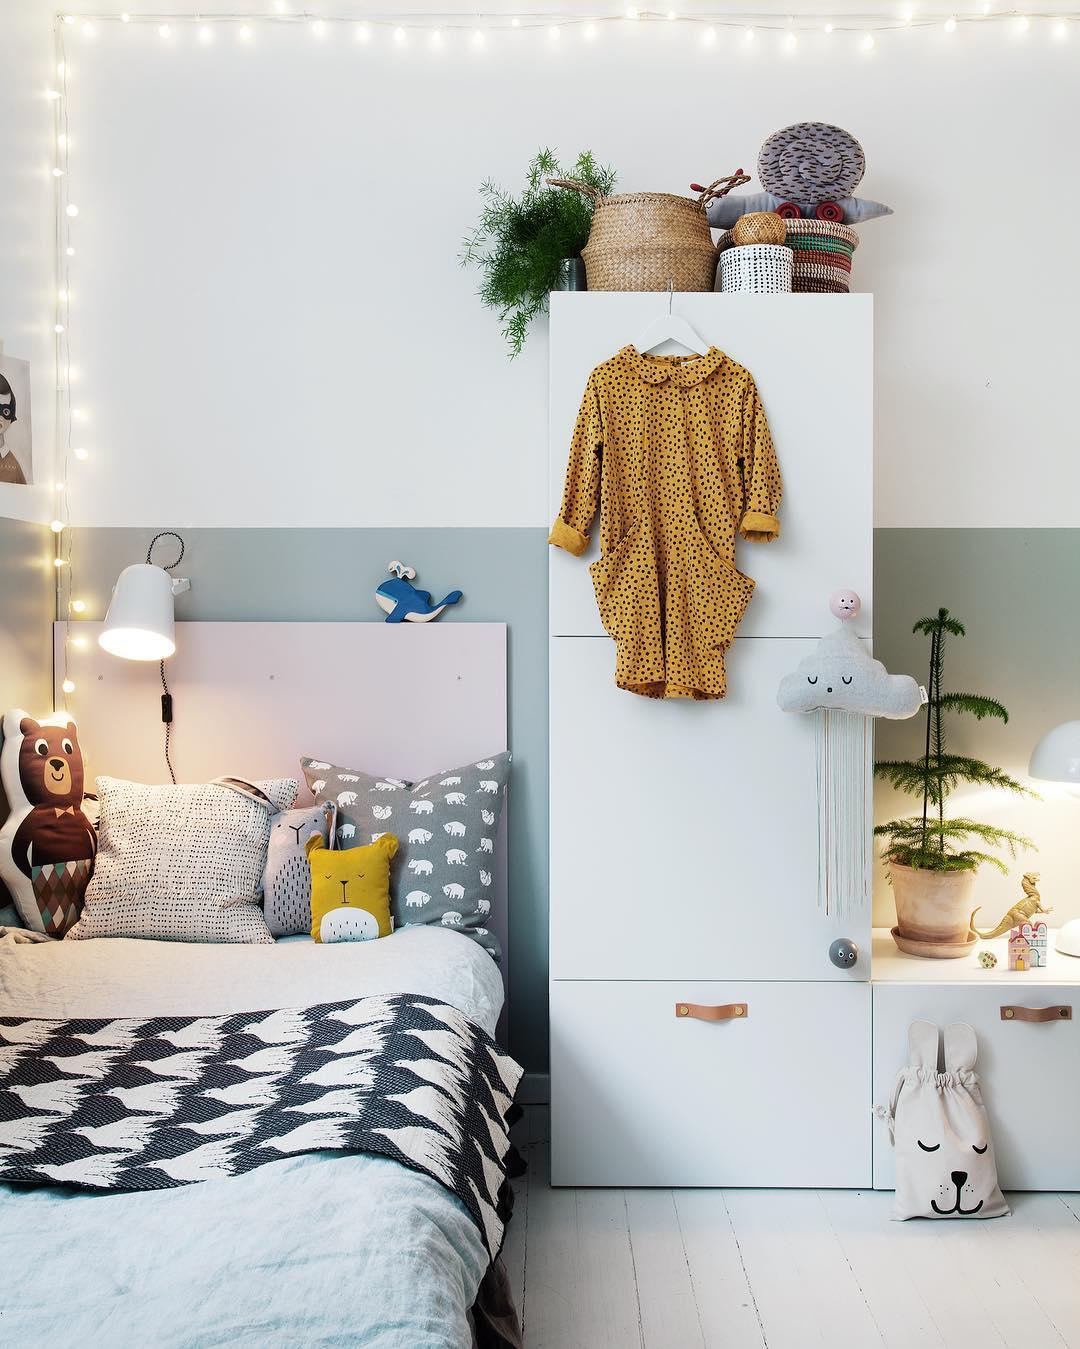 5 id es pour ranger une chambre d 39 enfant lili in wonderland. Black Bedroom Furniture Sets. Home Design Ideas